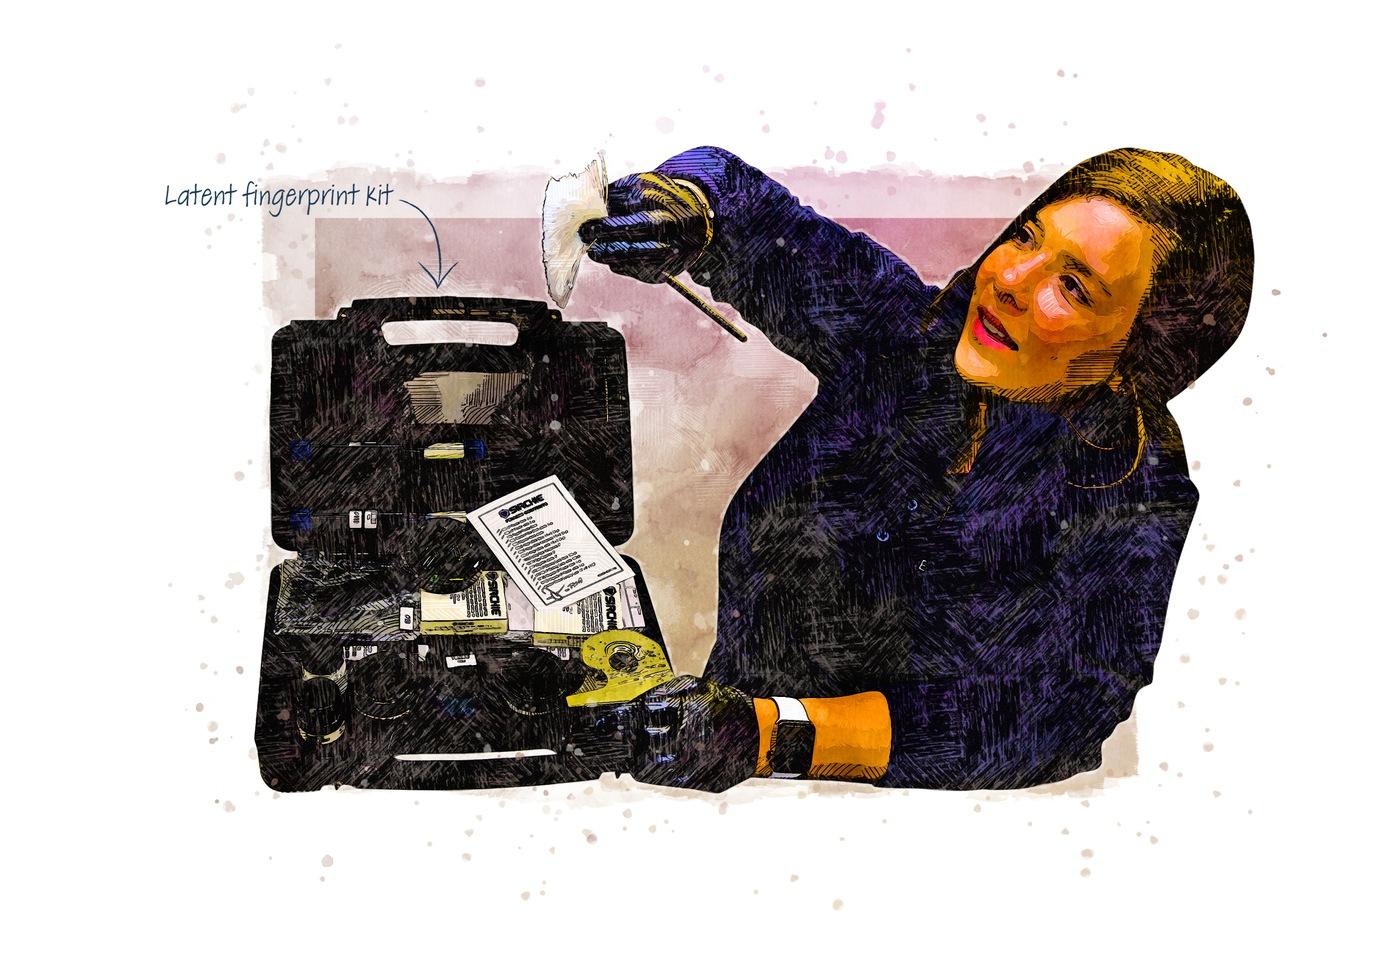 Illustration of the crime scene fingerprint kit that helps teams uncover and collect fingerprints.